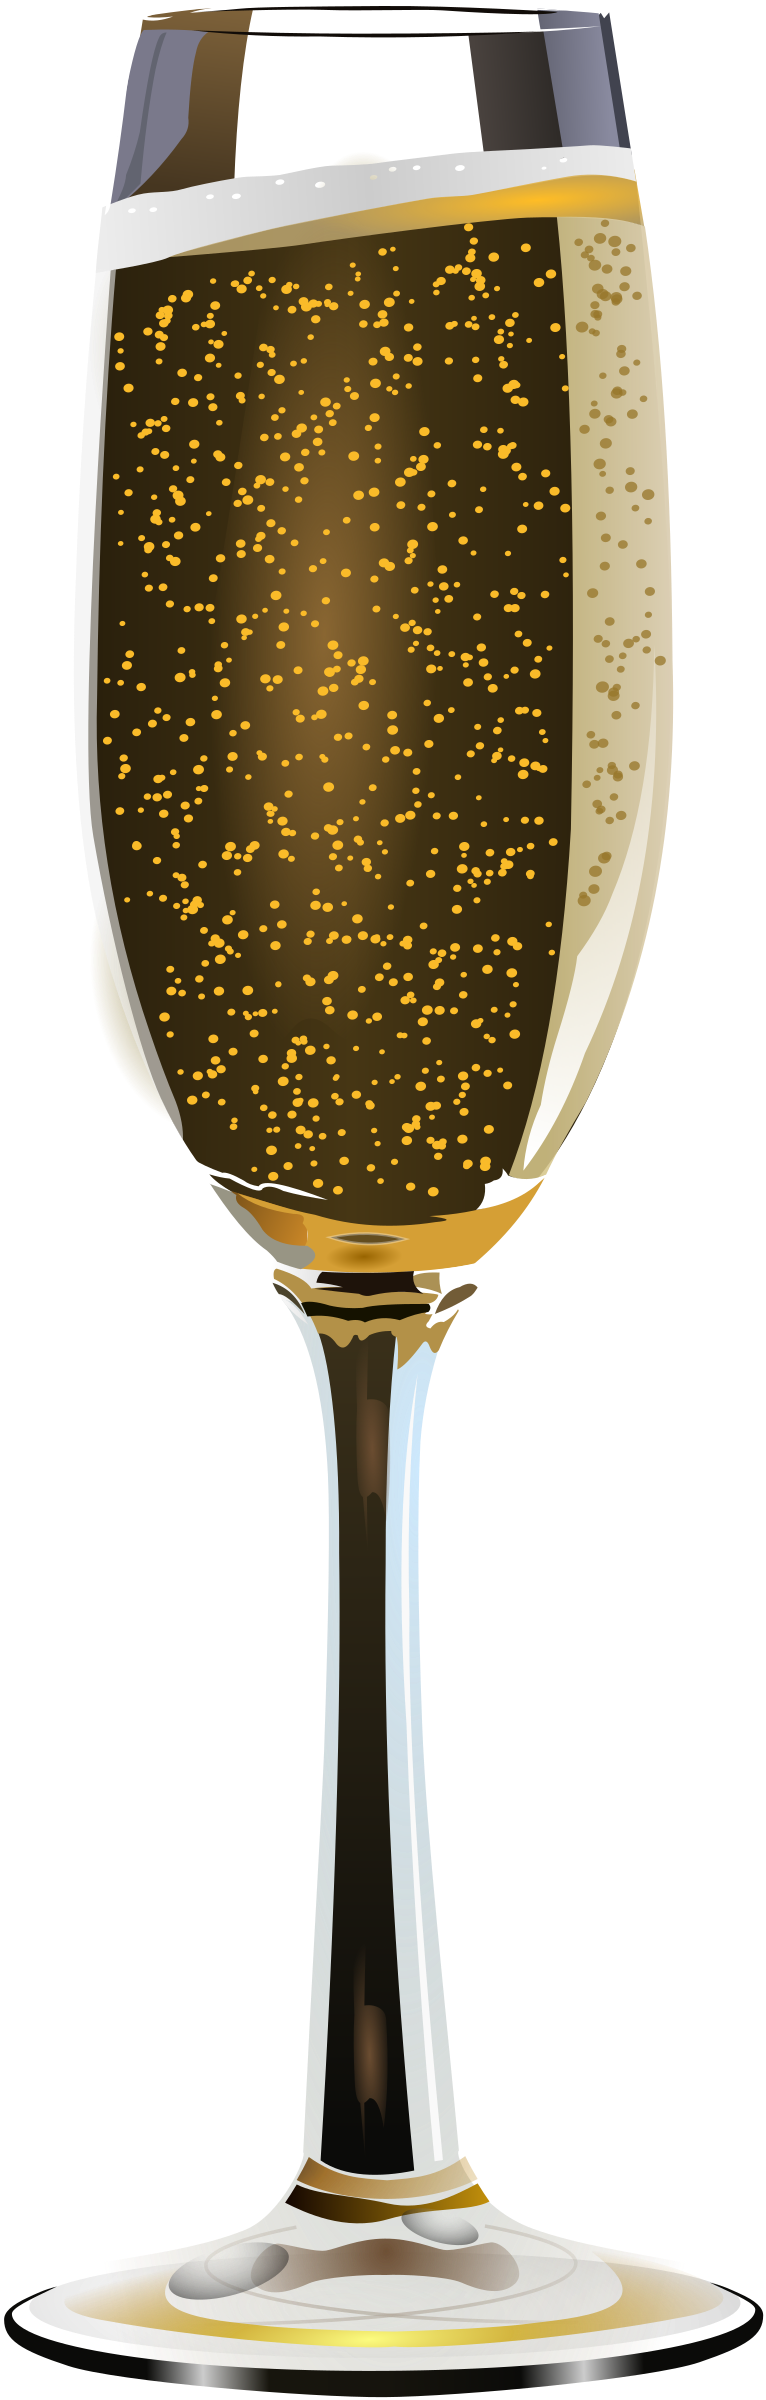 Champagne glass clip art clipart.